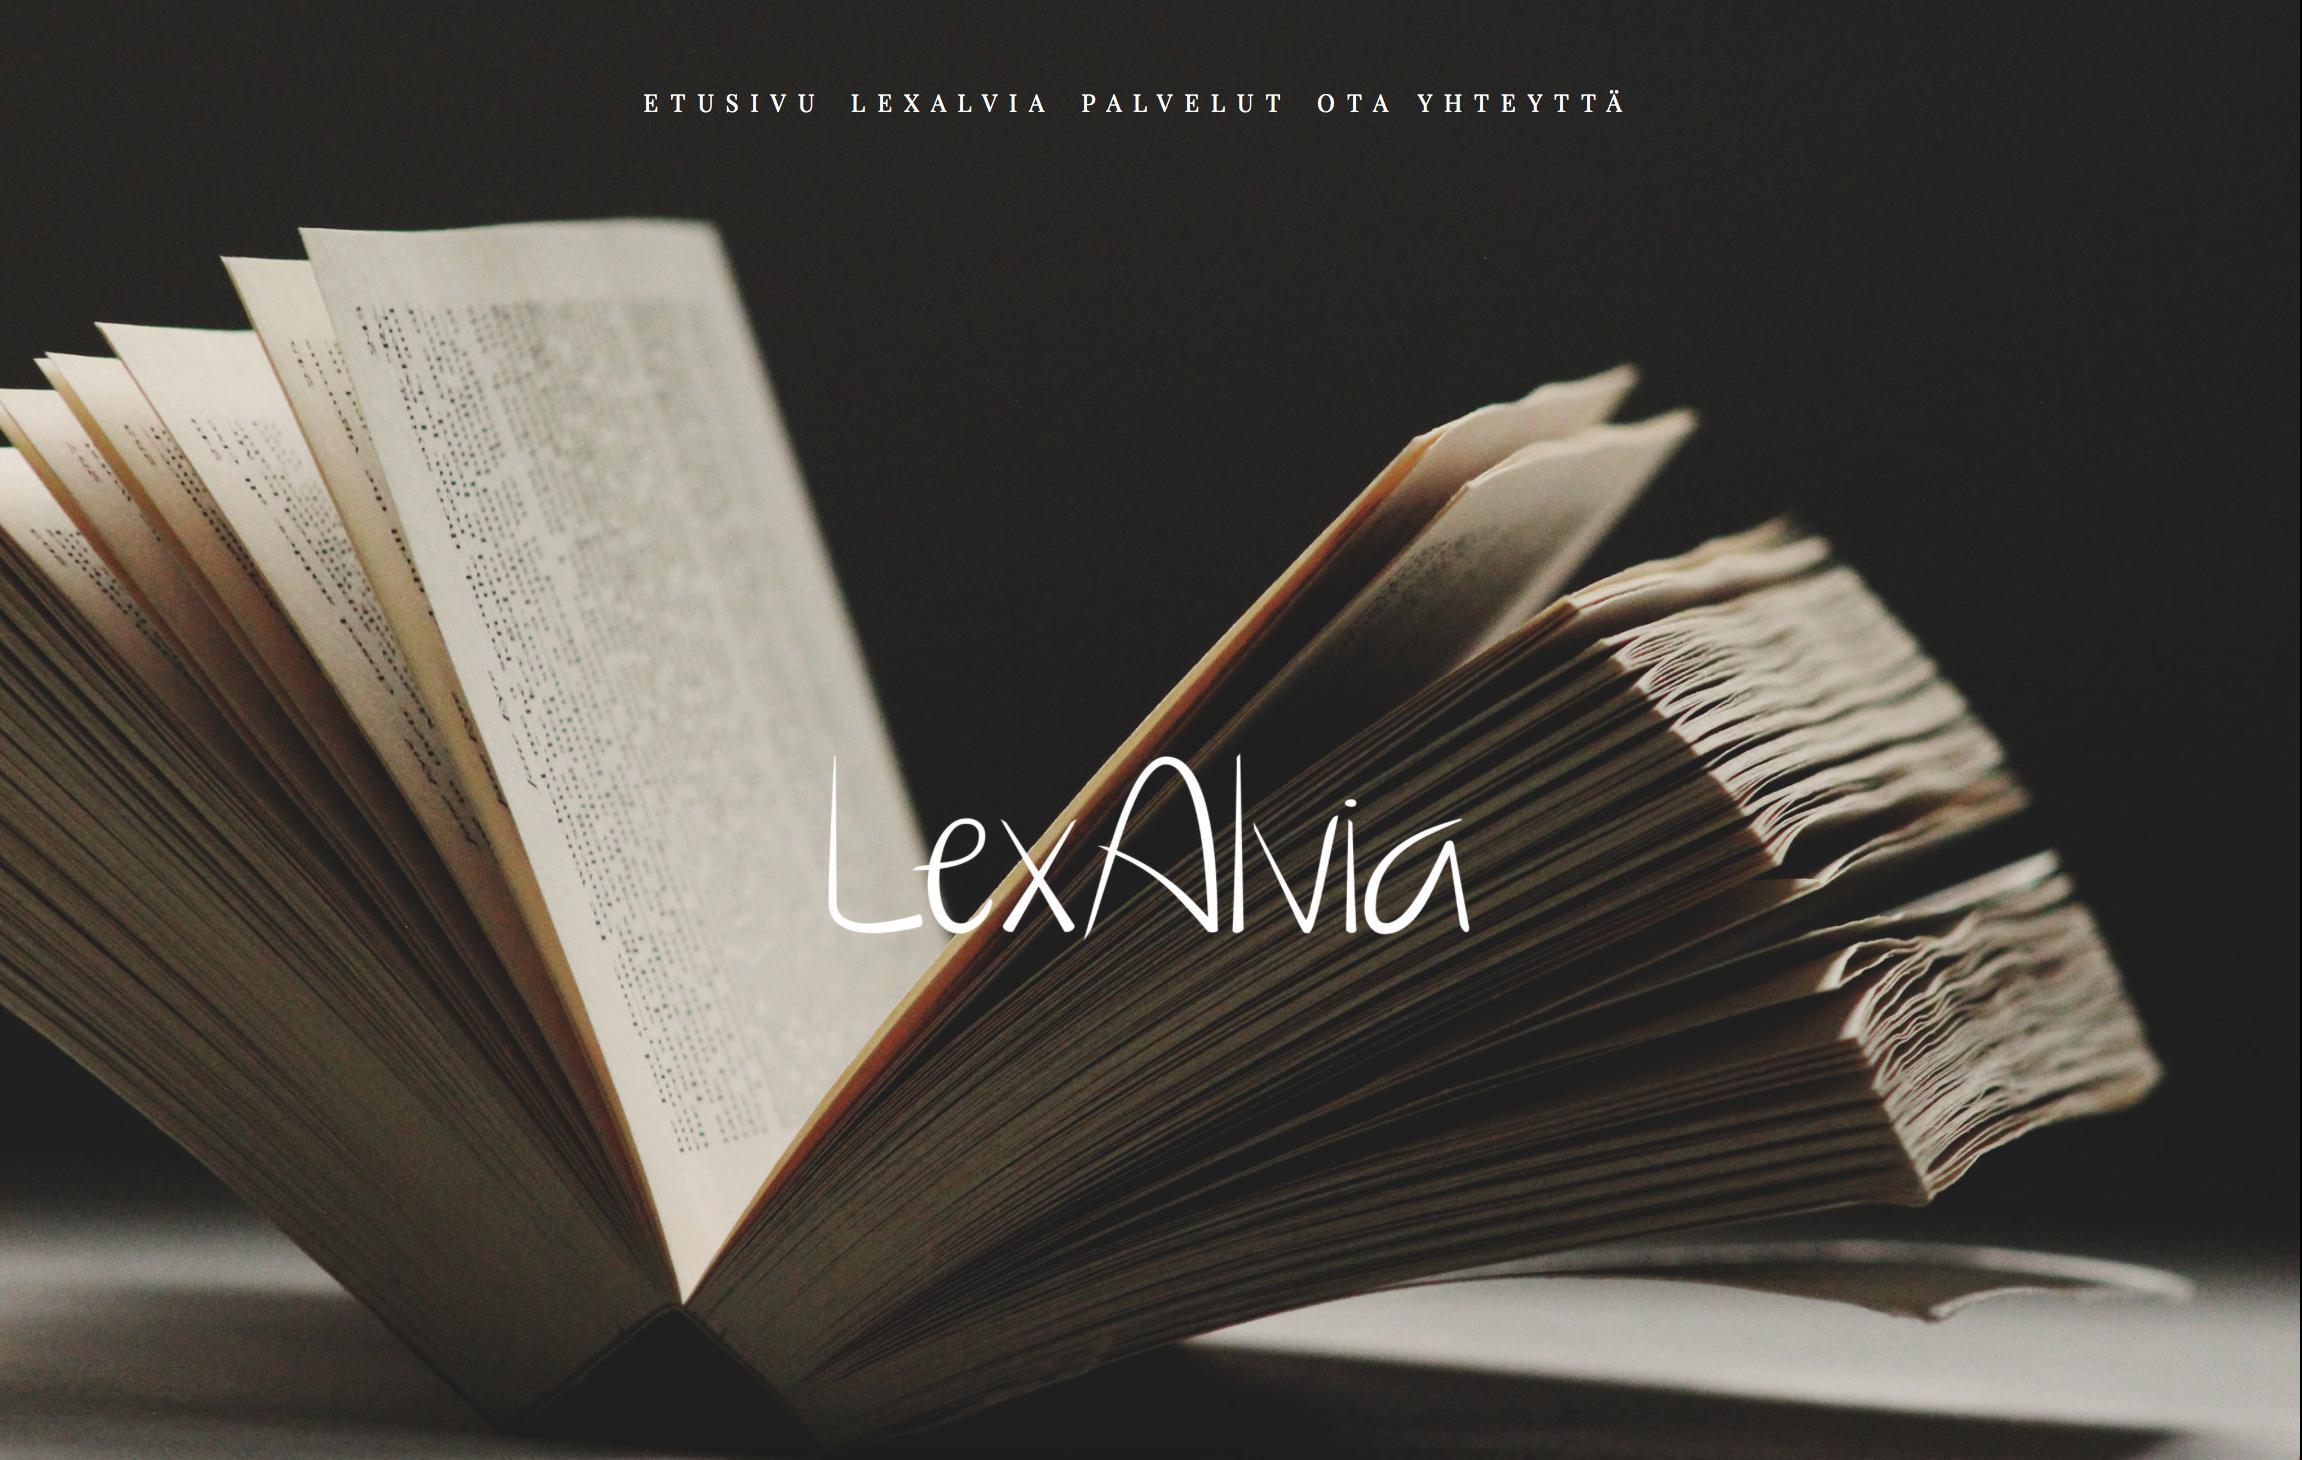 lexalvia etusivu.png